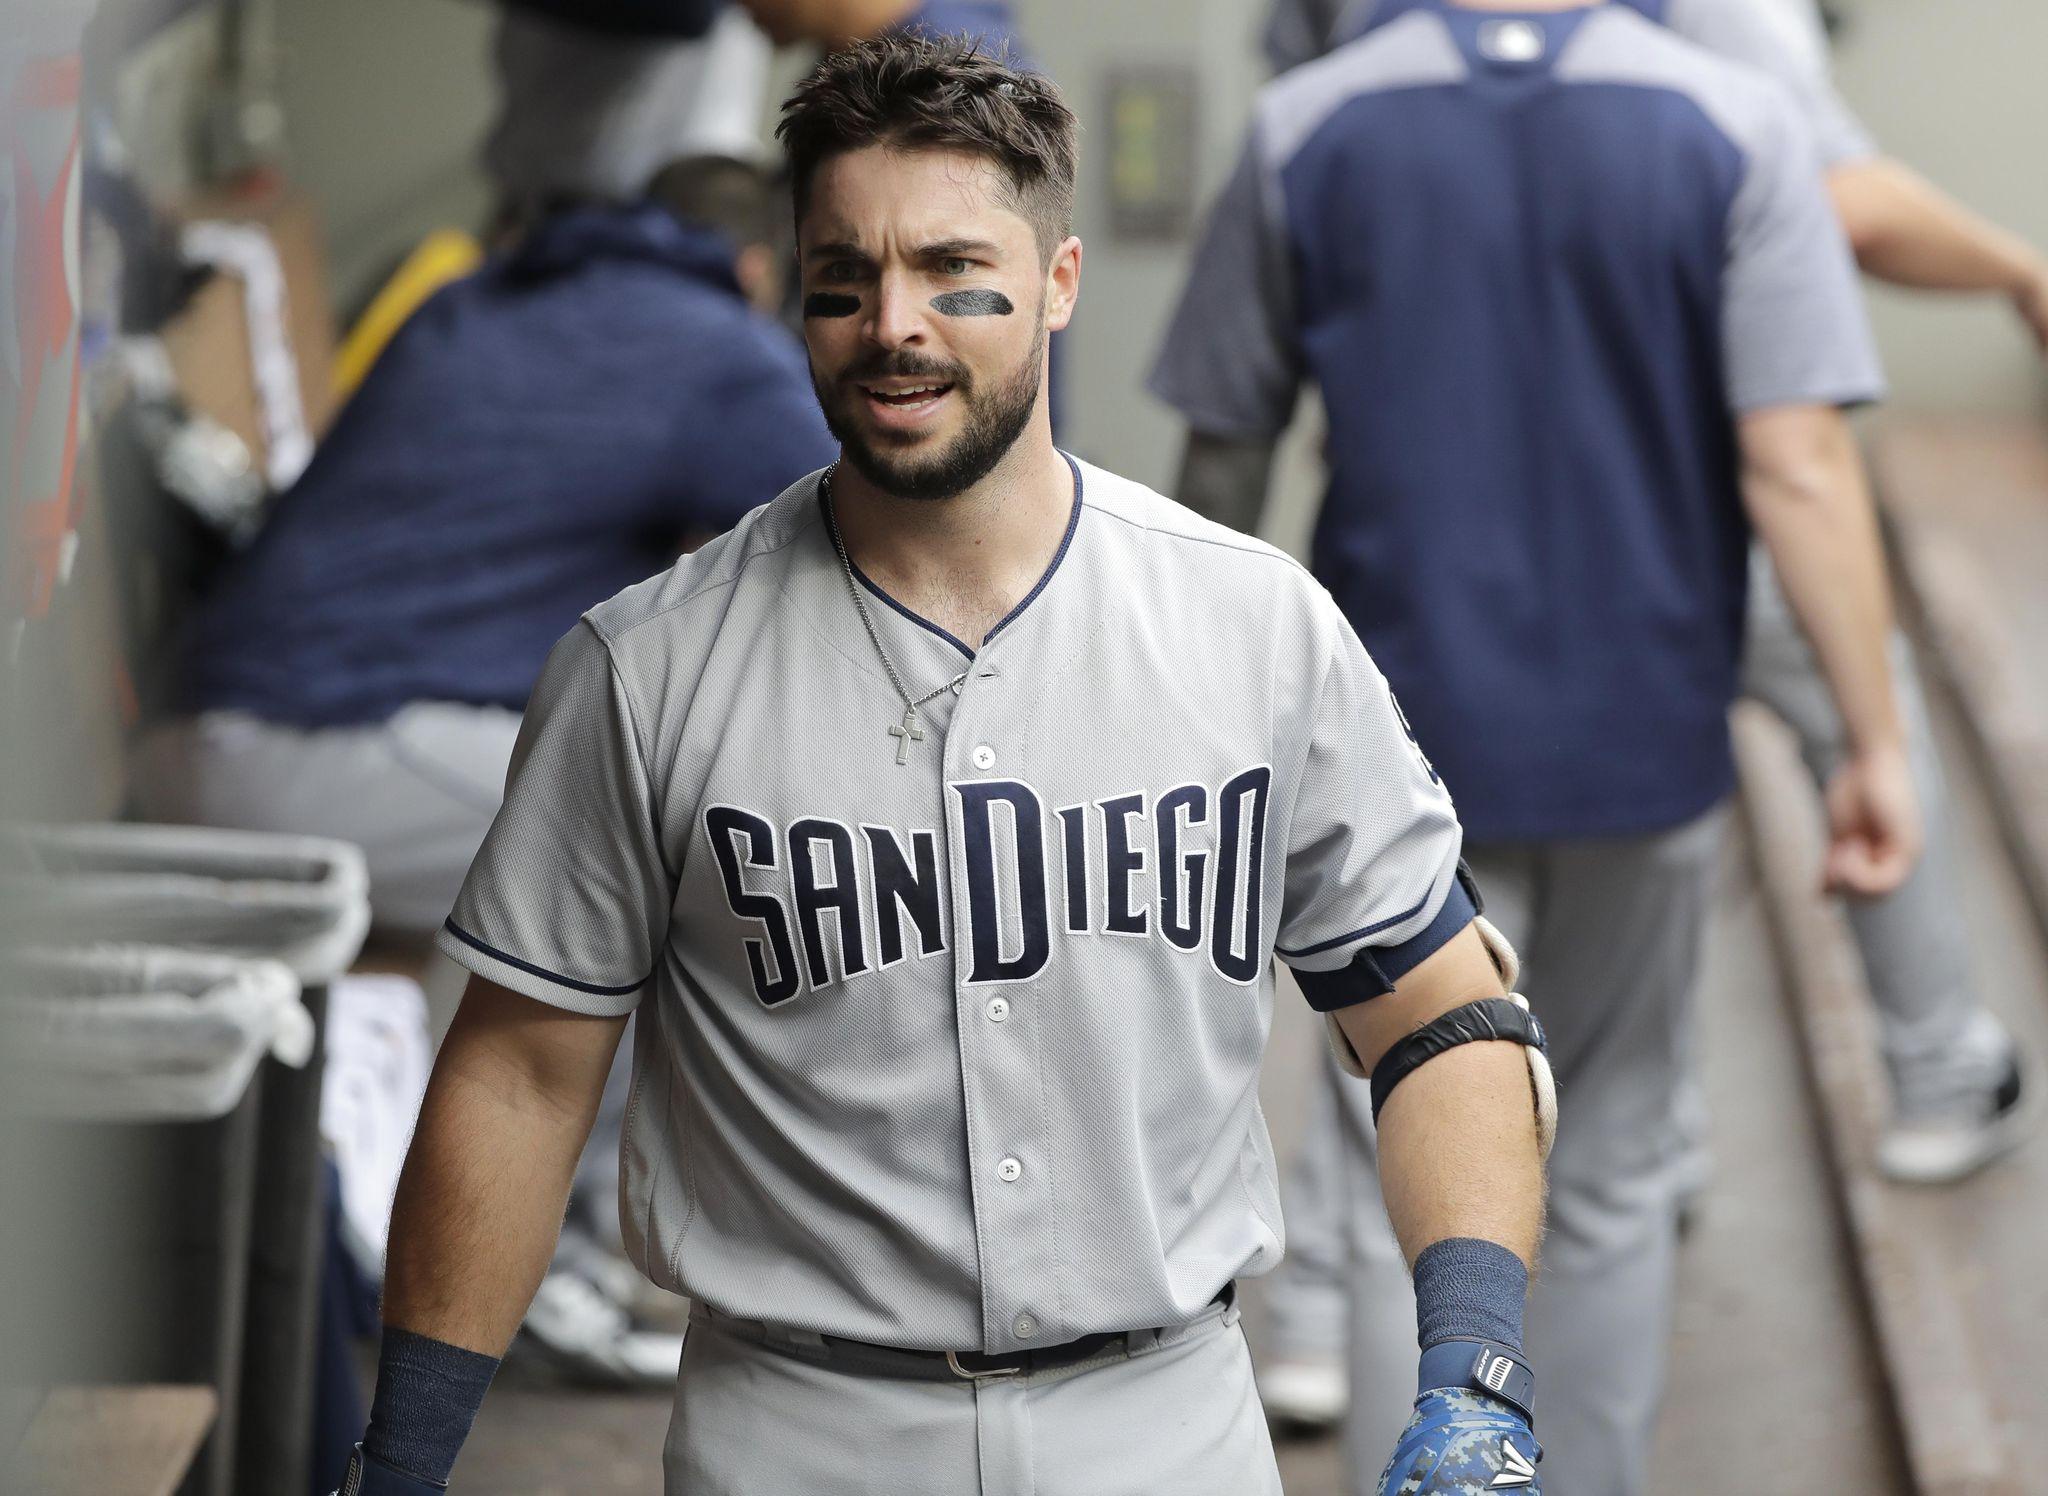 Padres_mariners_baseball_63364_s2048x1496